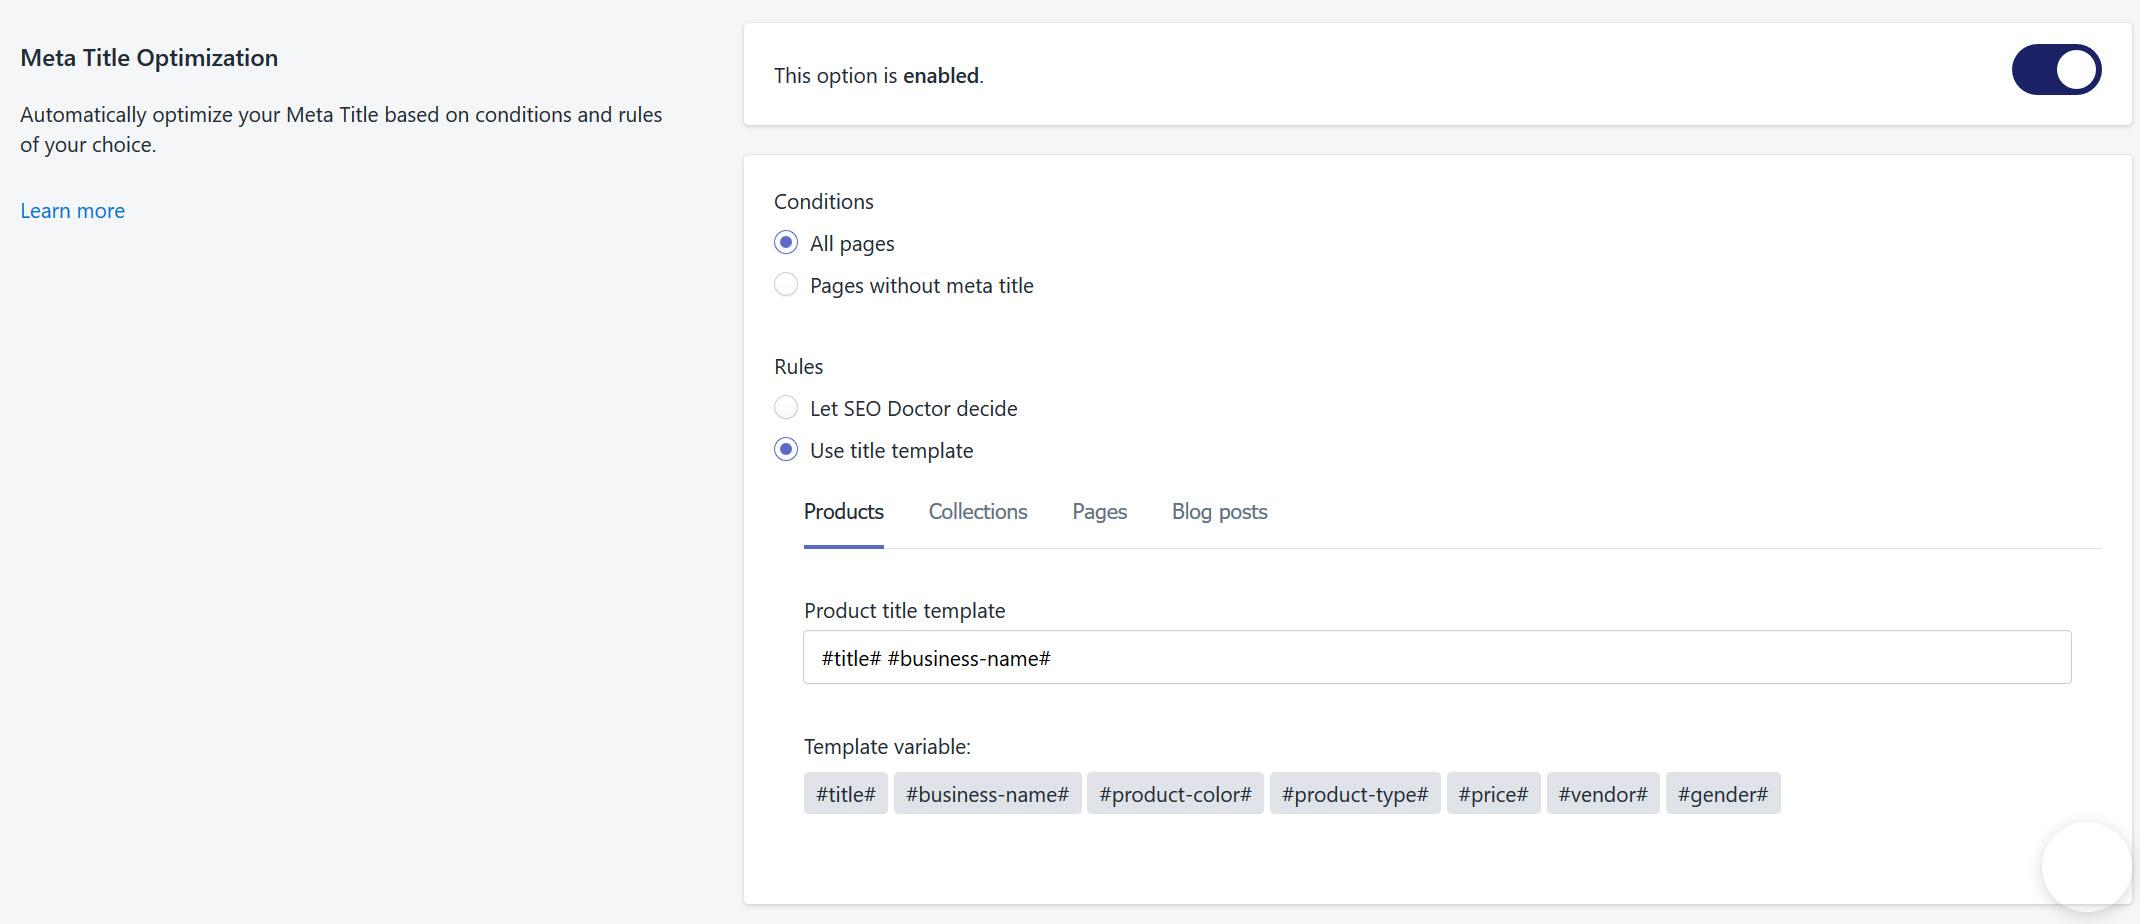 SEO Doctor Meta Title Optimization